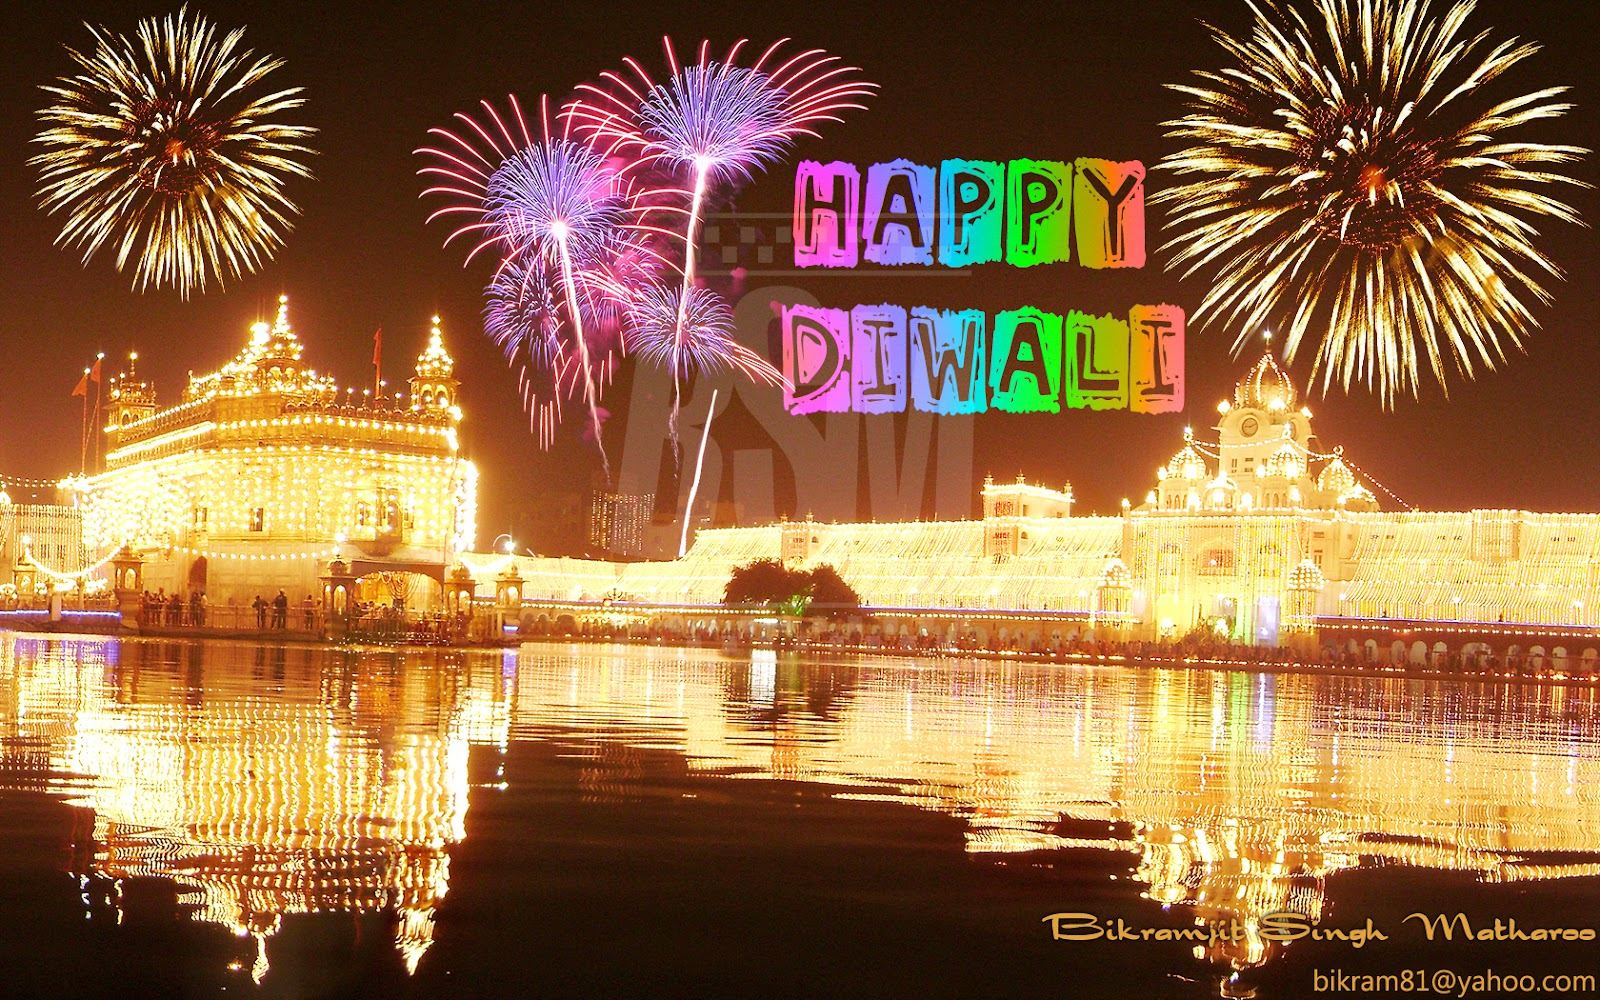 Sikh Animated Wallpaper Free Wallpicz Diwali Wallpaper Desktop Hd